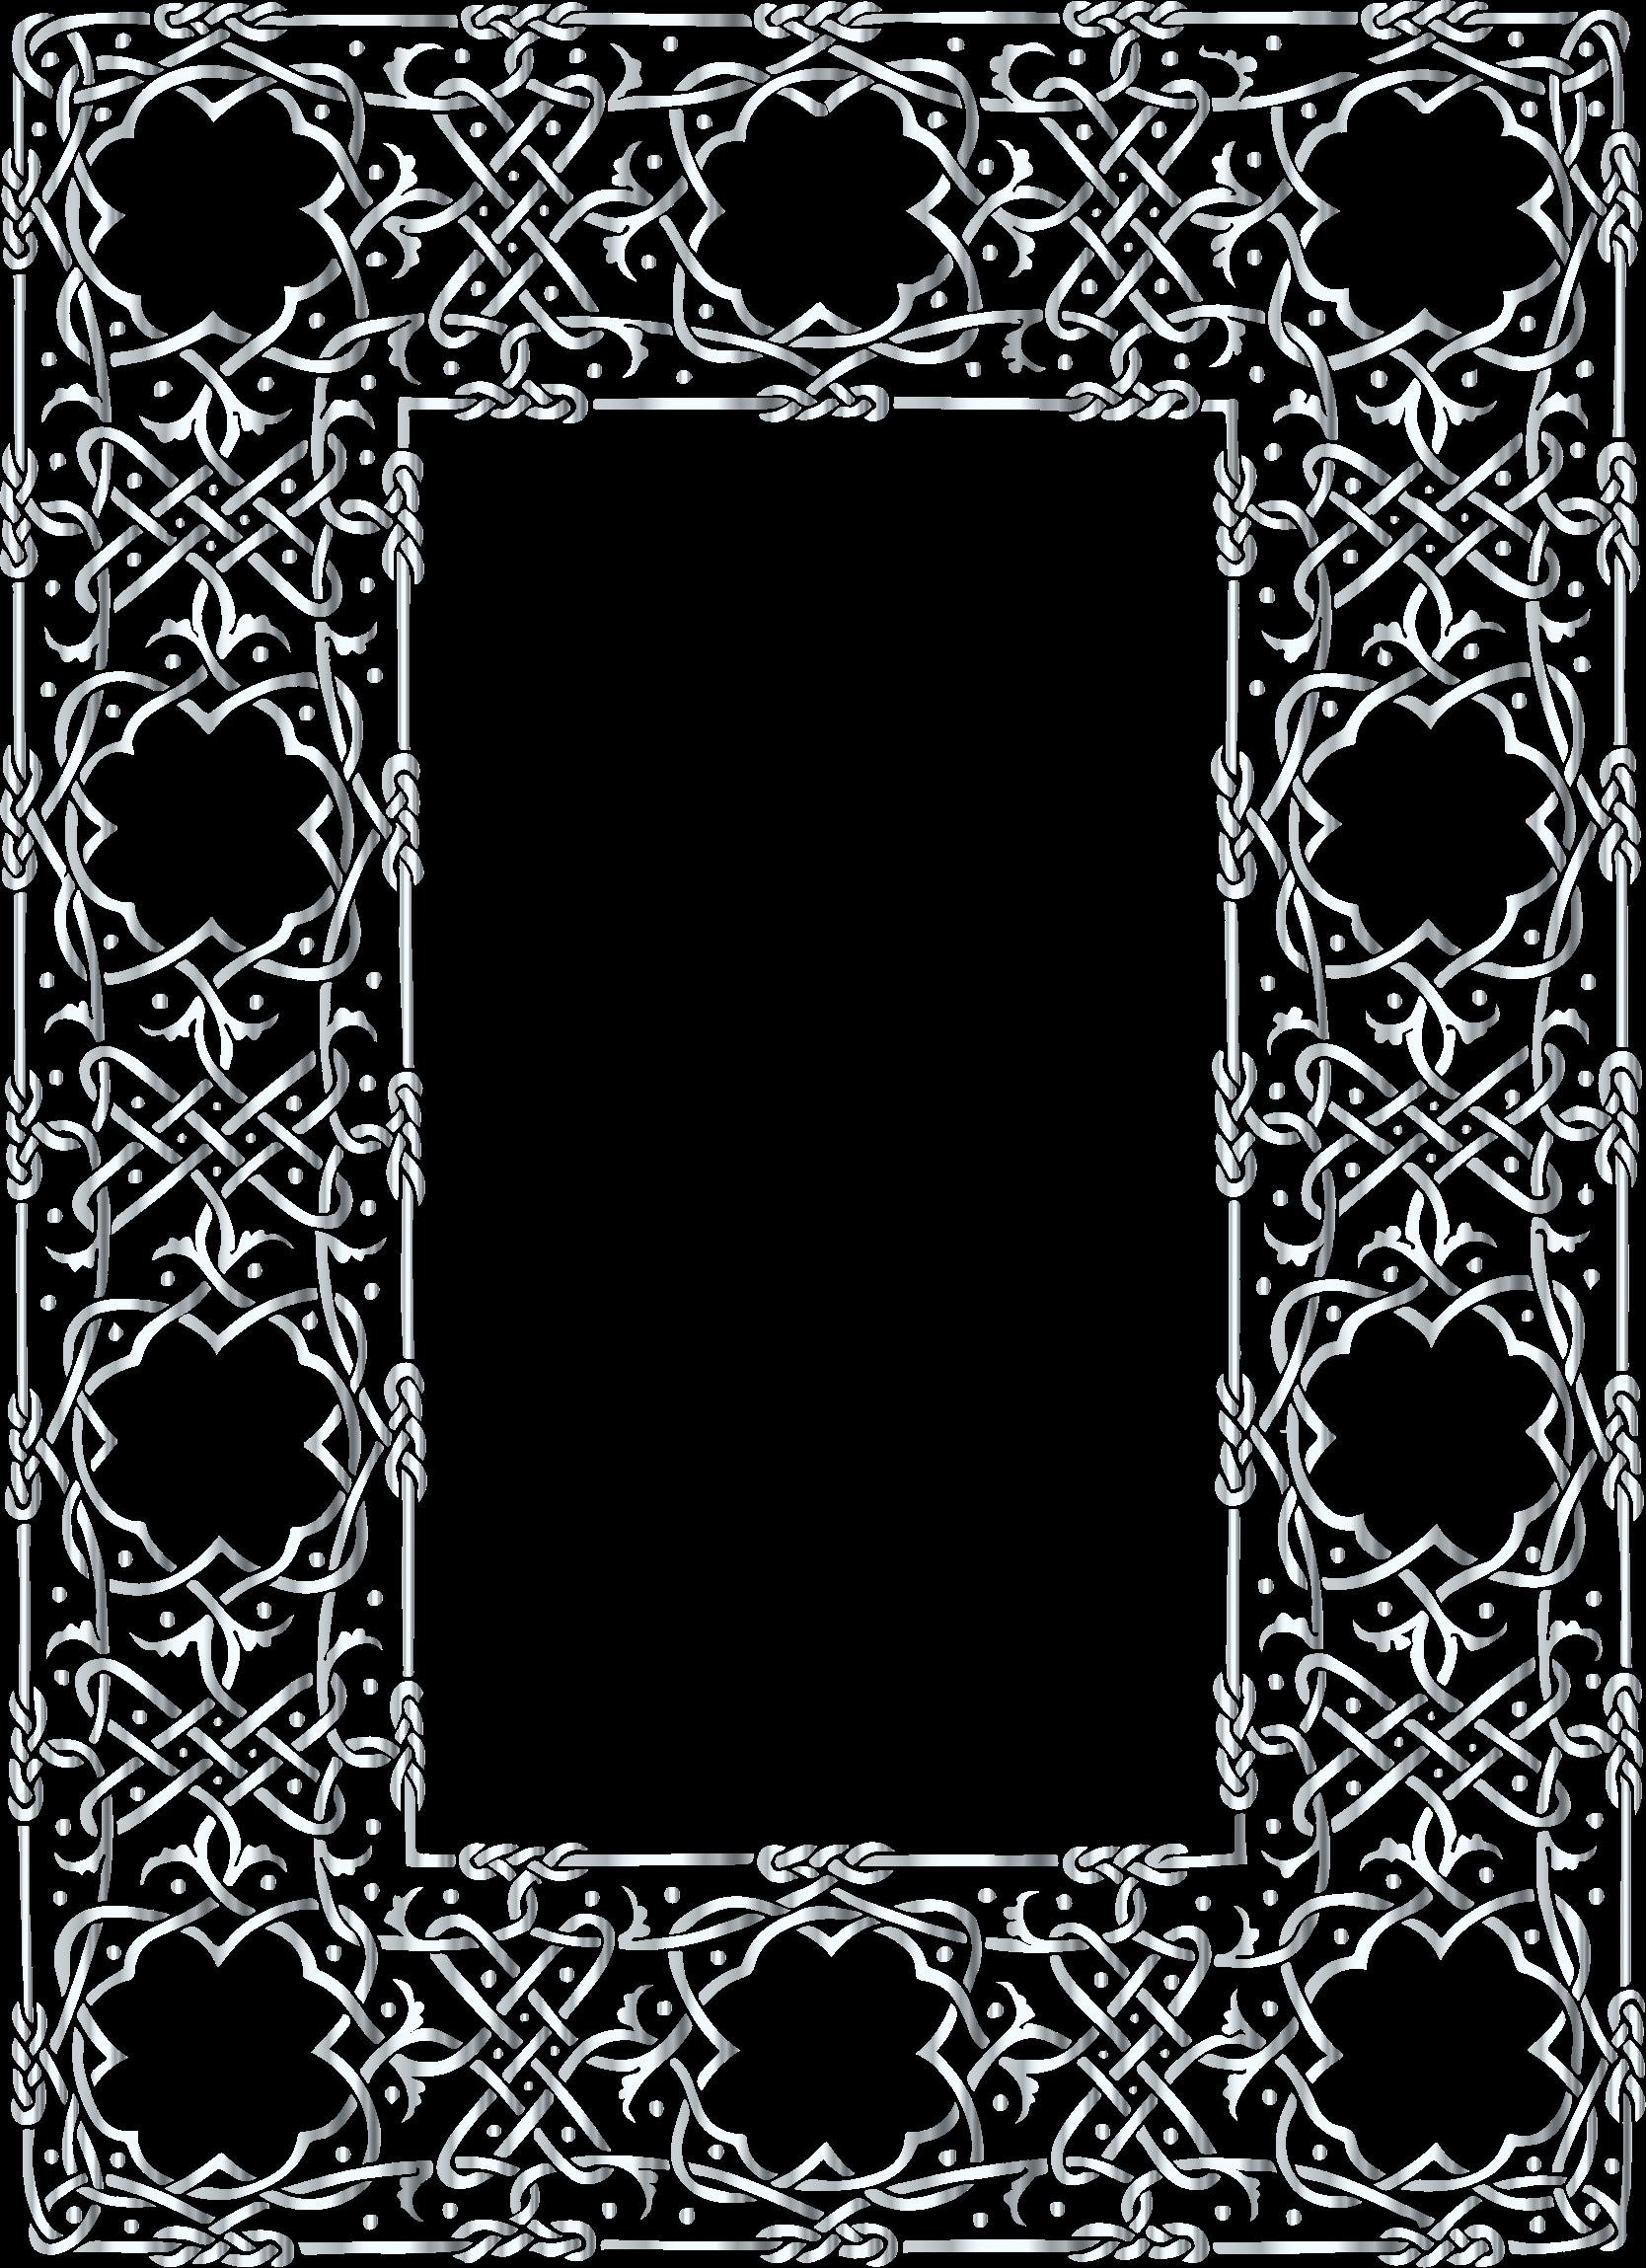 Frame clipart silver. Ornate geometric no background